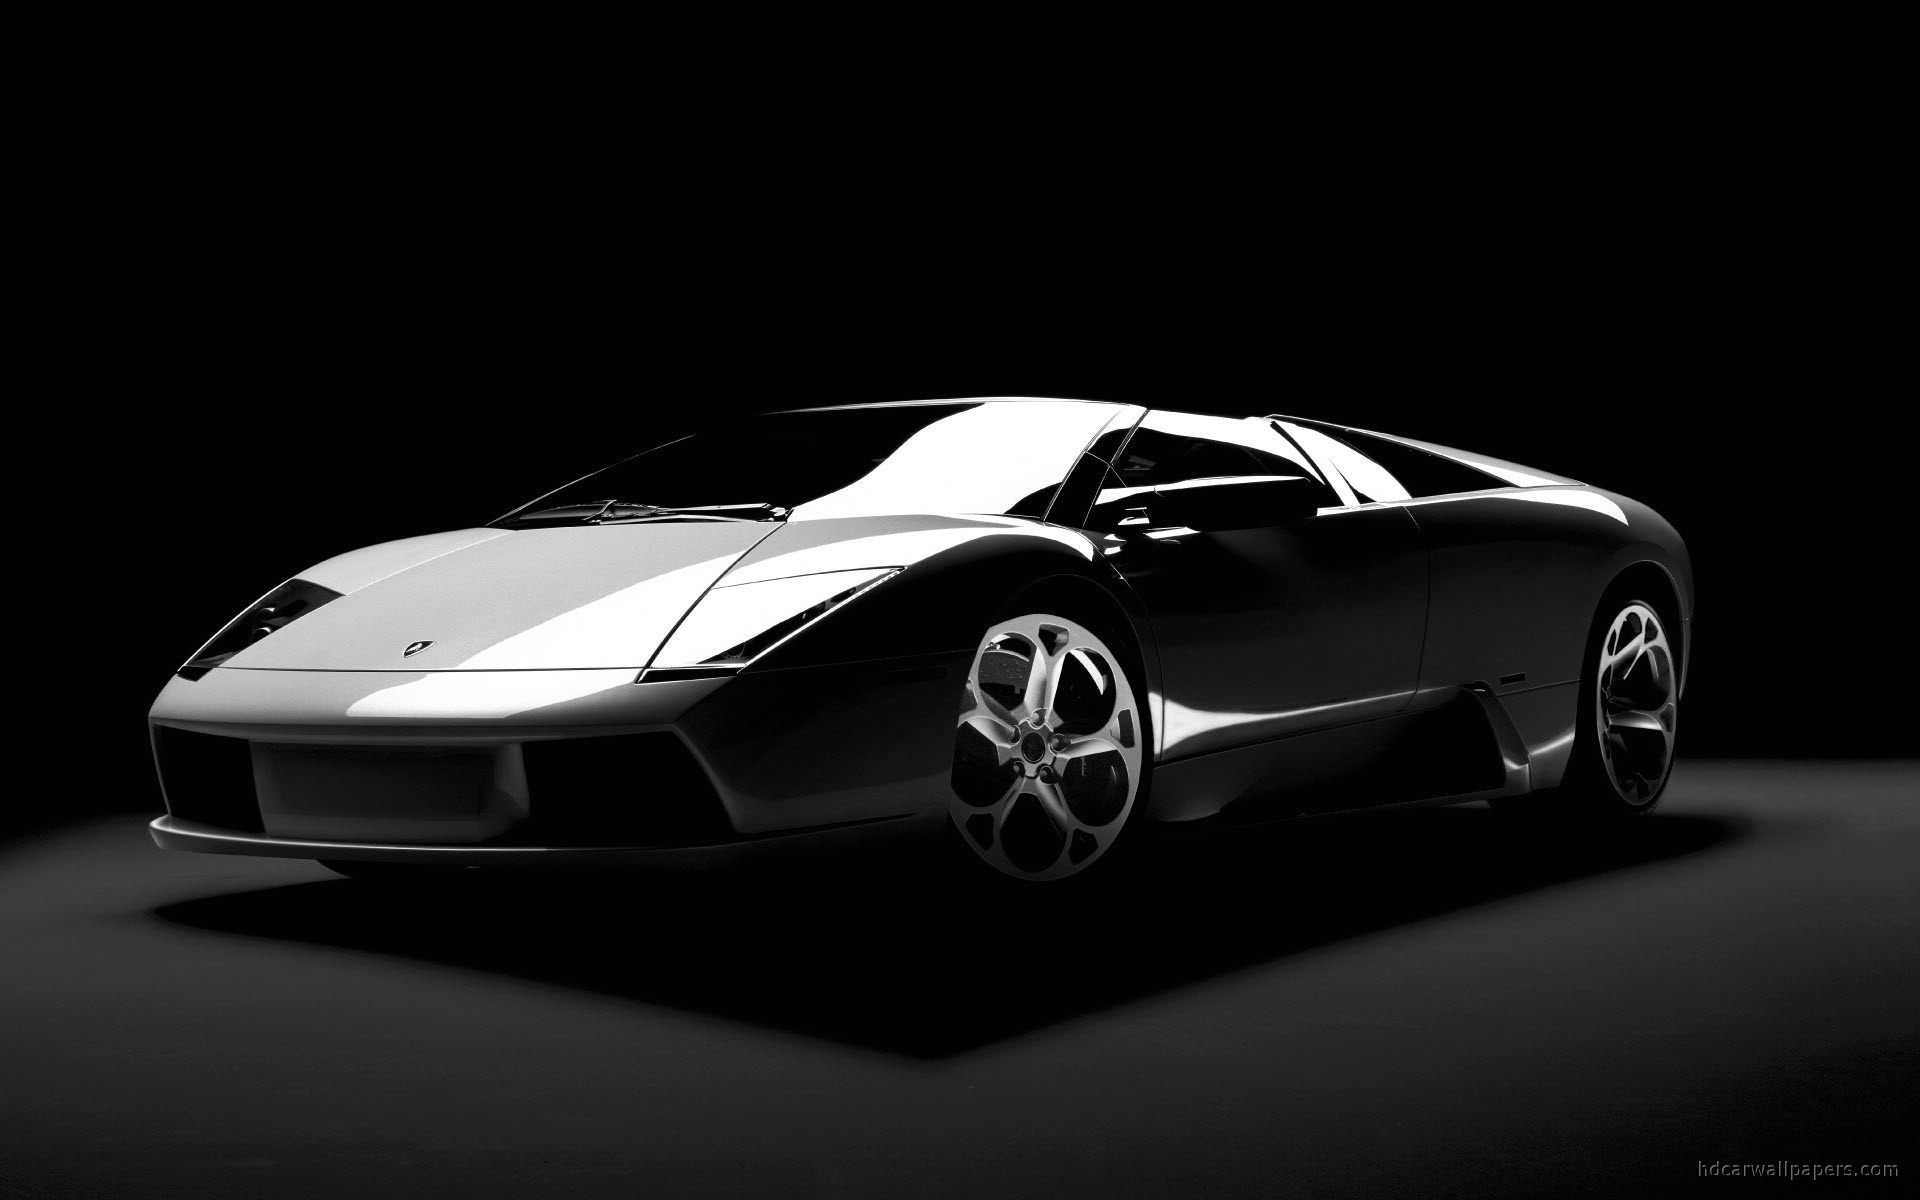 Lamborghini All New Wallpaper Hd Car Wallpapers Id 857